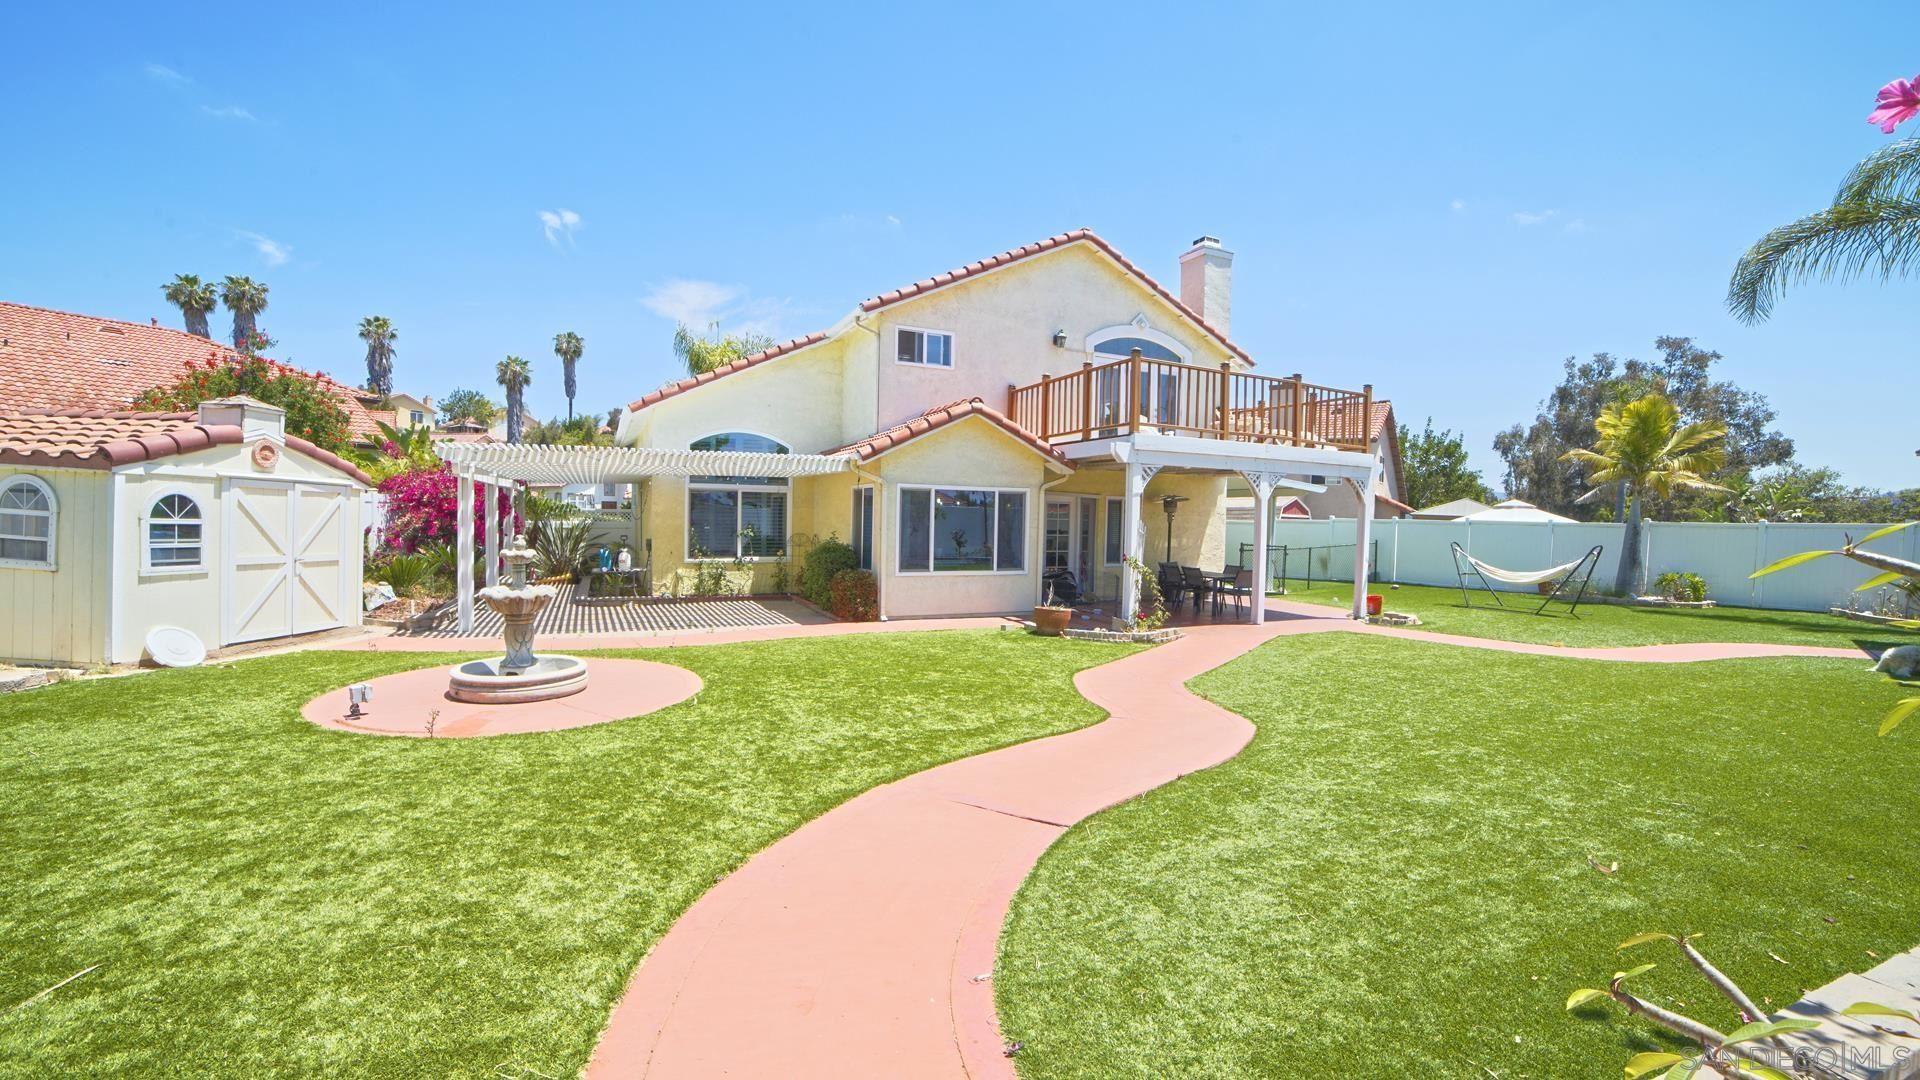 Photo of 1438 Southview Ct., Chula Vista, CA 91910 (MLS # 210016119)